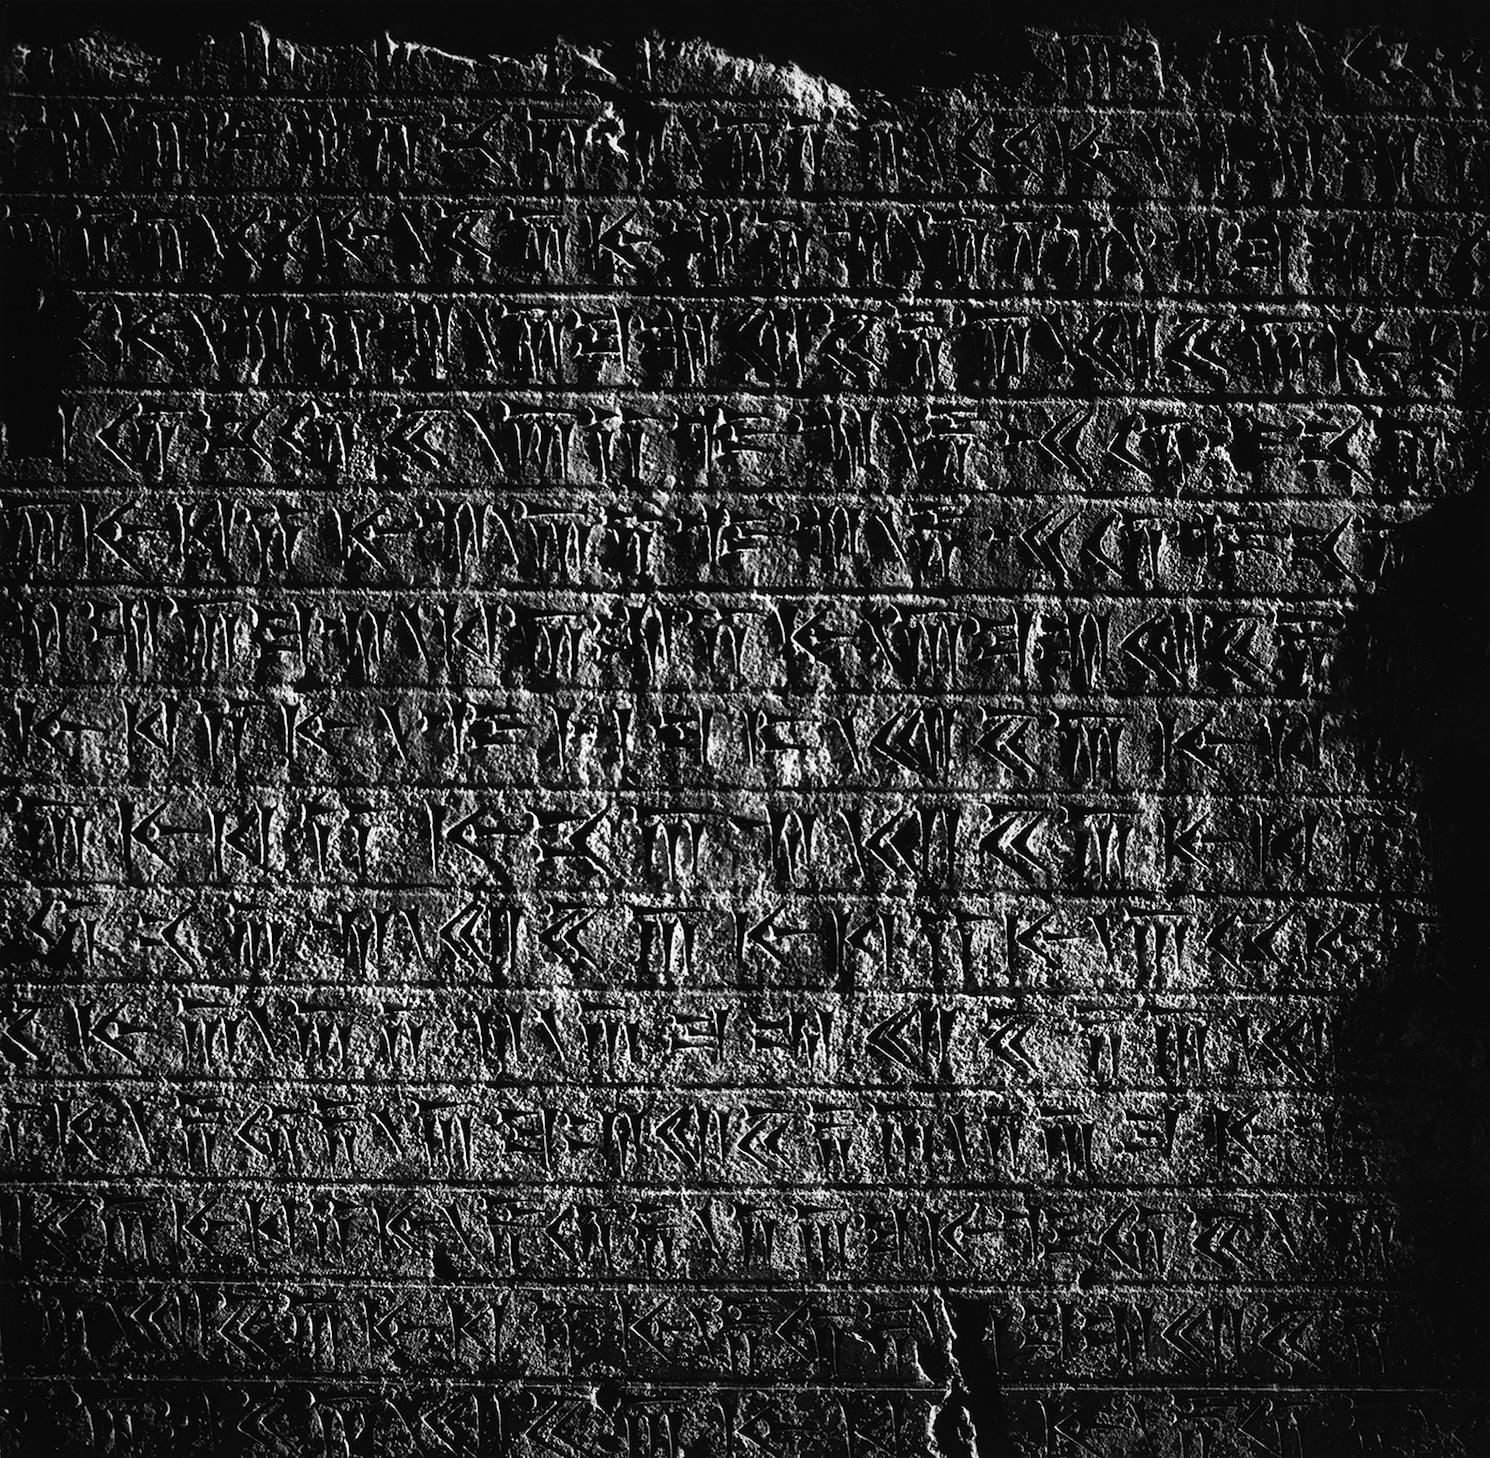 Cuneiform inscription, Iran